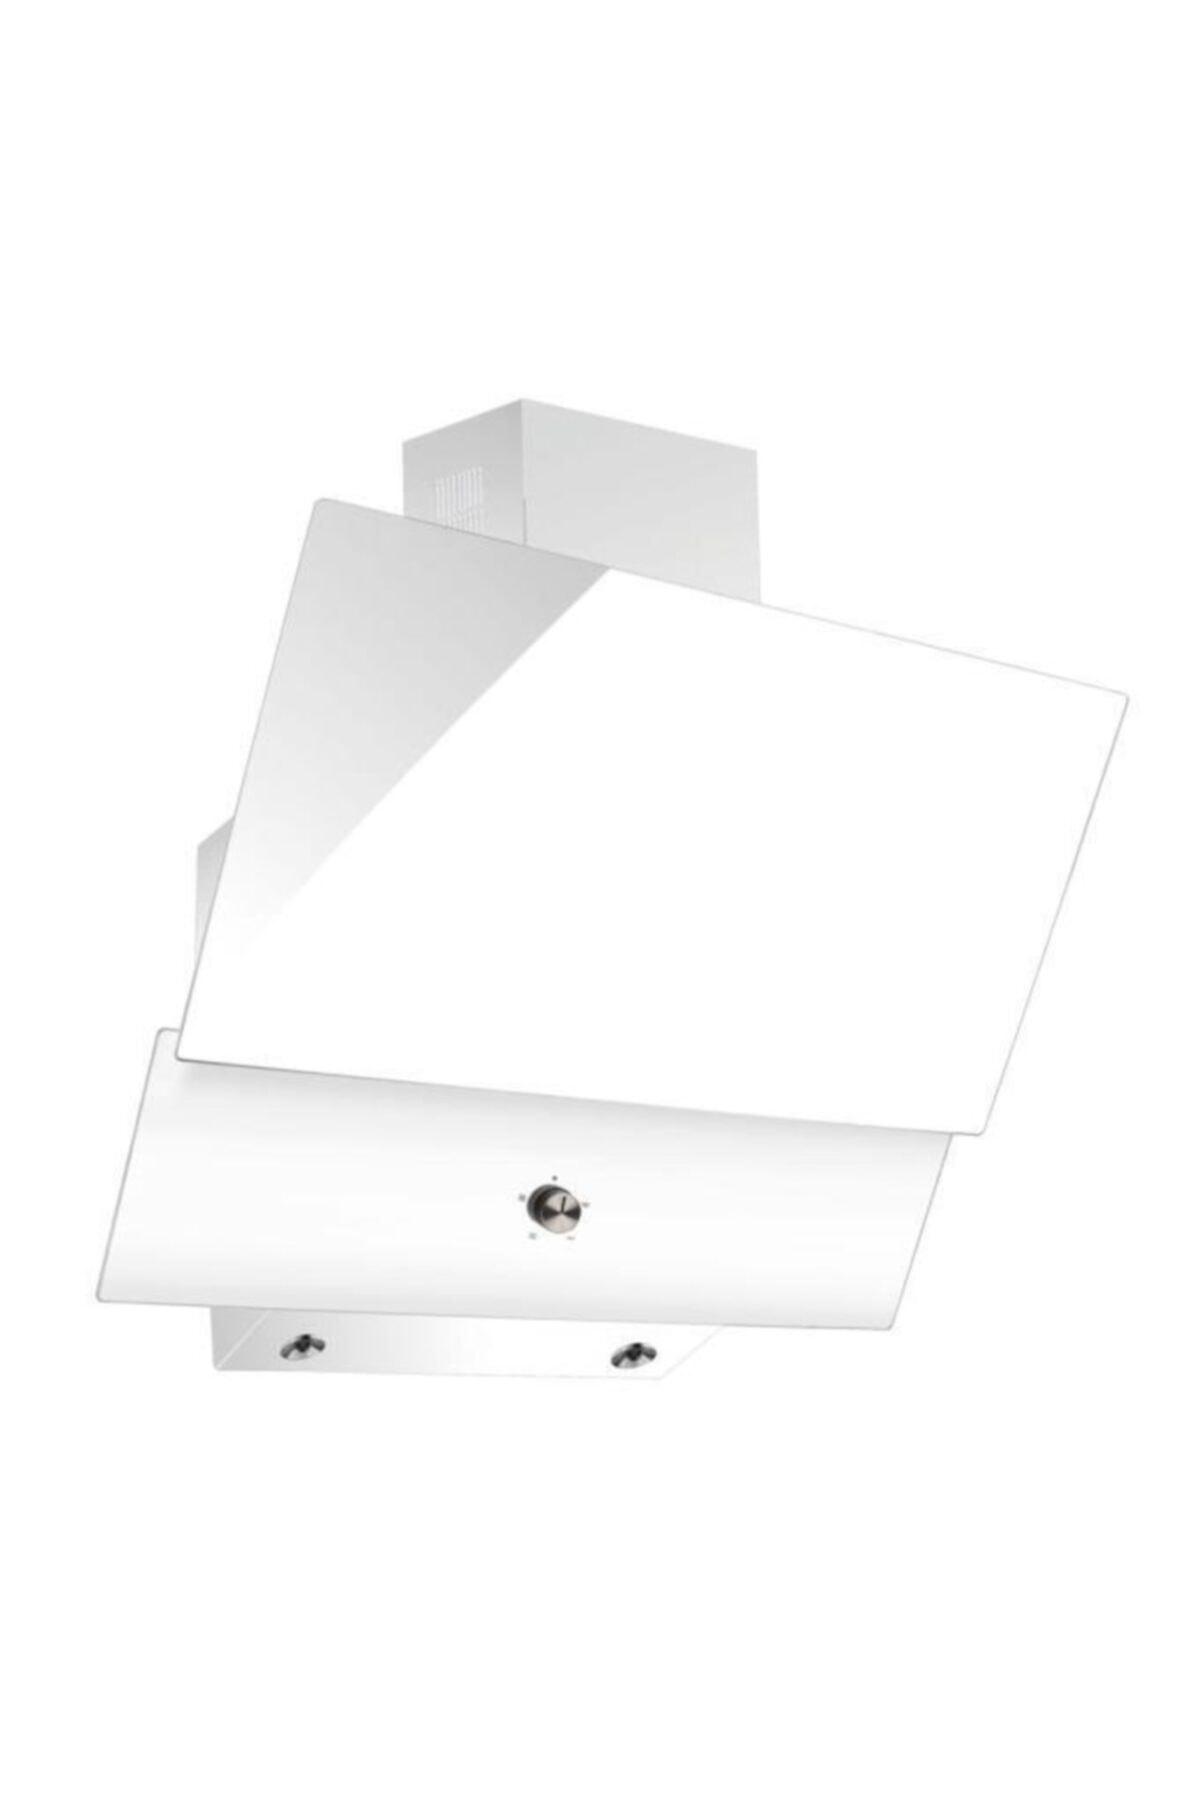 Luxell Kristal Beyaz Ankastre Set 2